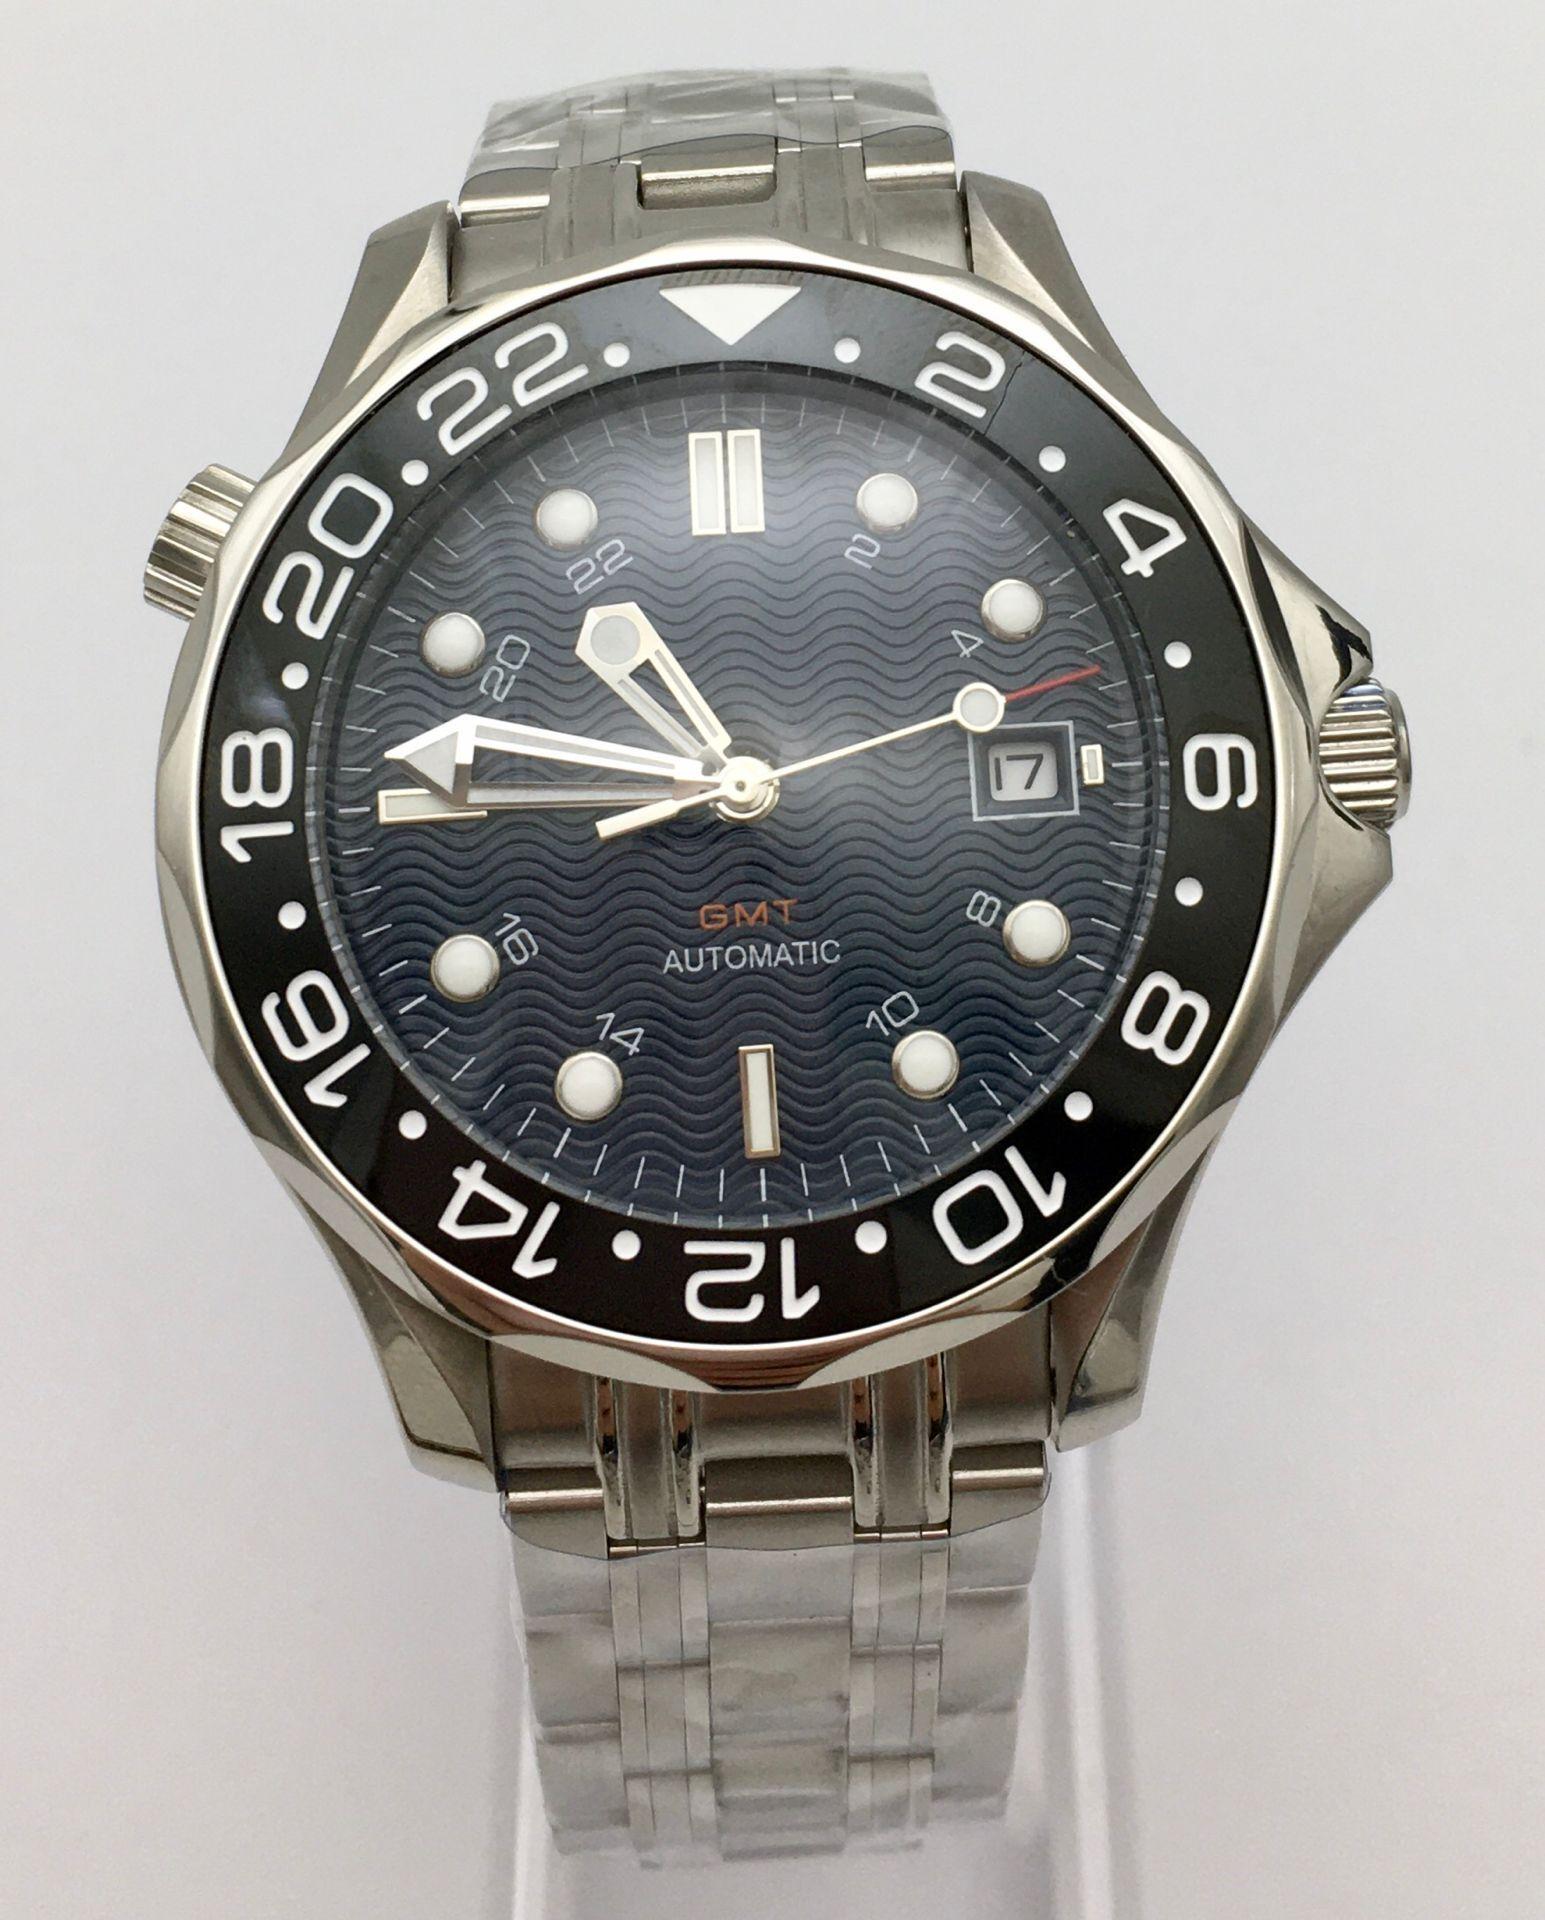 41cm Blue Wave Dial Mechanical Men's Watch Automatic Watch Men's Clock Date Ceramic Bezel Stainless Steel Solid Case